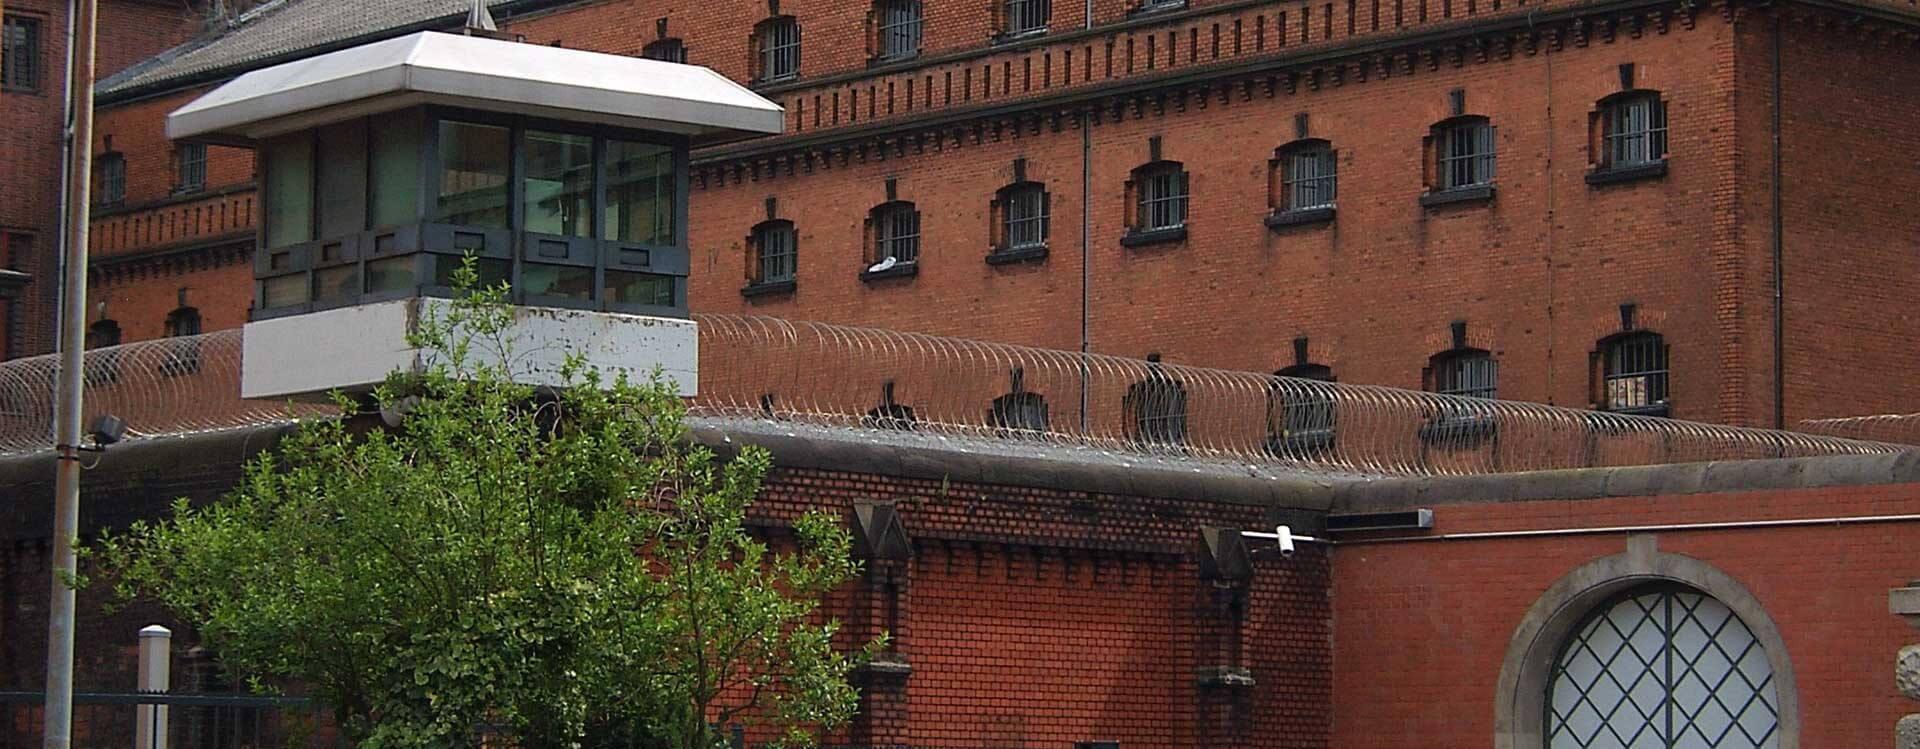 Untersuchungshaft (U-Haft) in Hamburg Holstenglacis